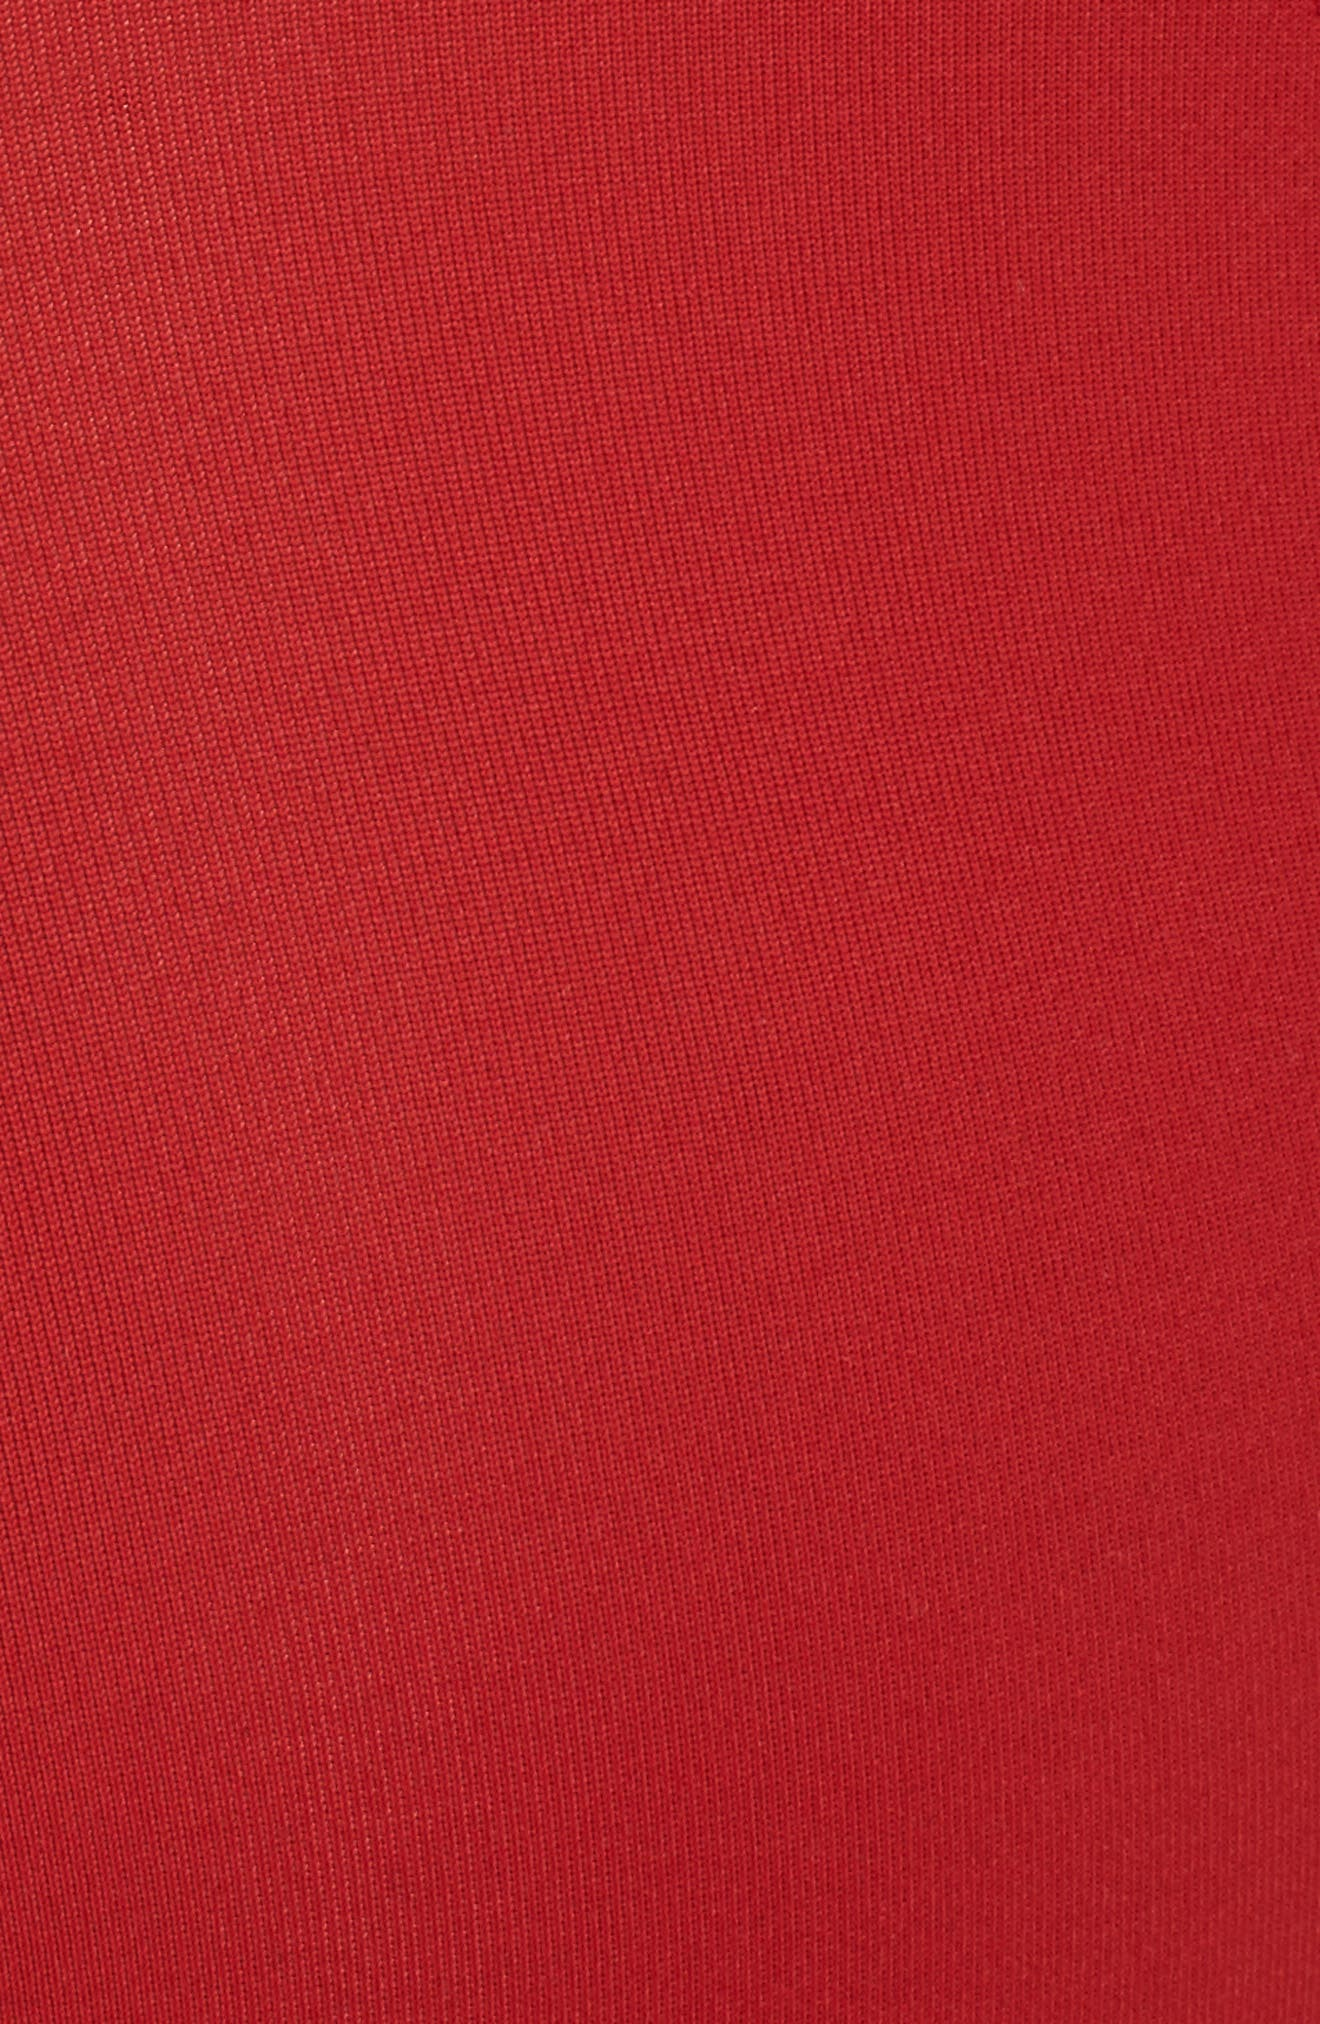 Good Body Core Ballet Thong Bodysuit,                             Alternate thumbnail 5, color,                             Red 001